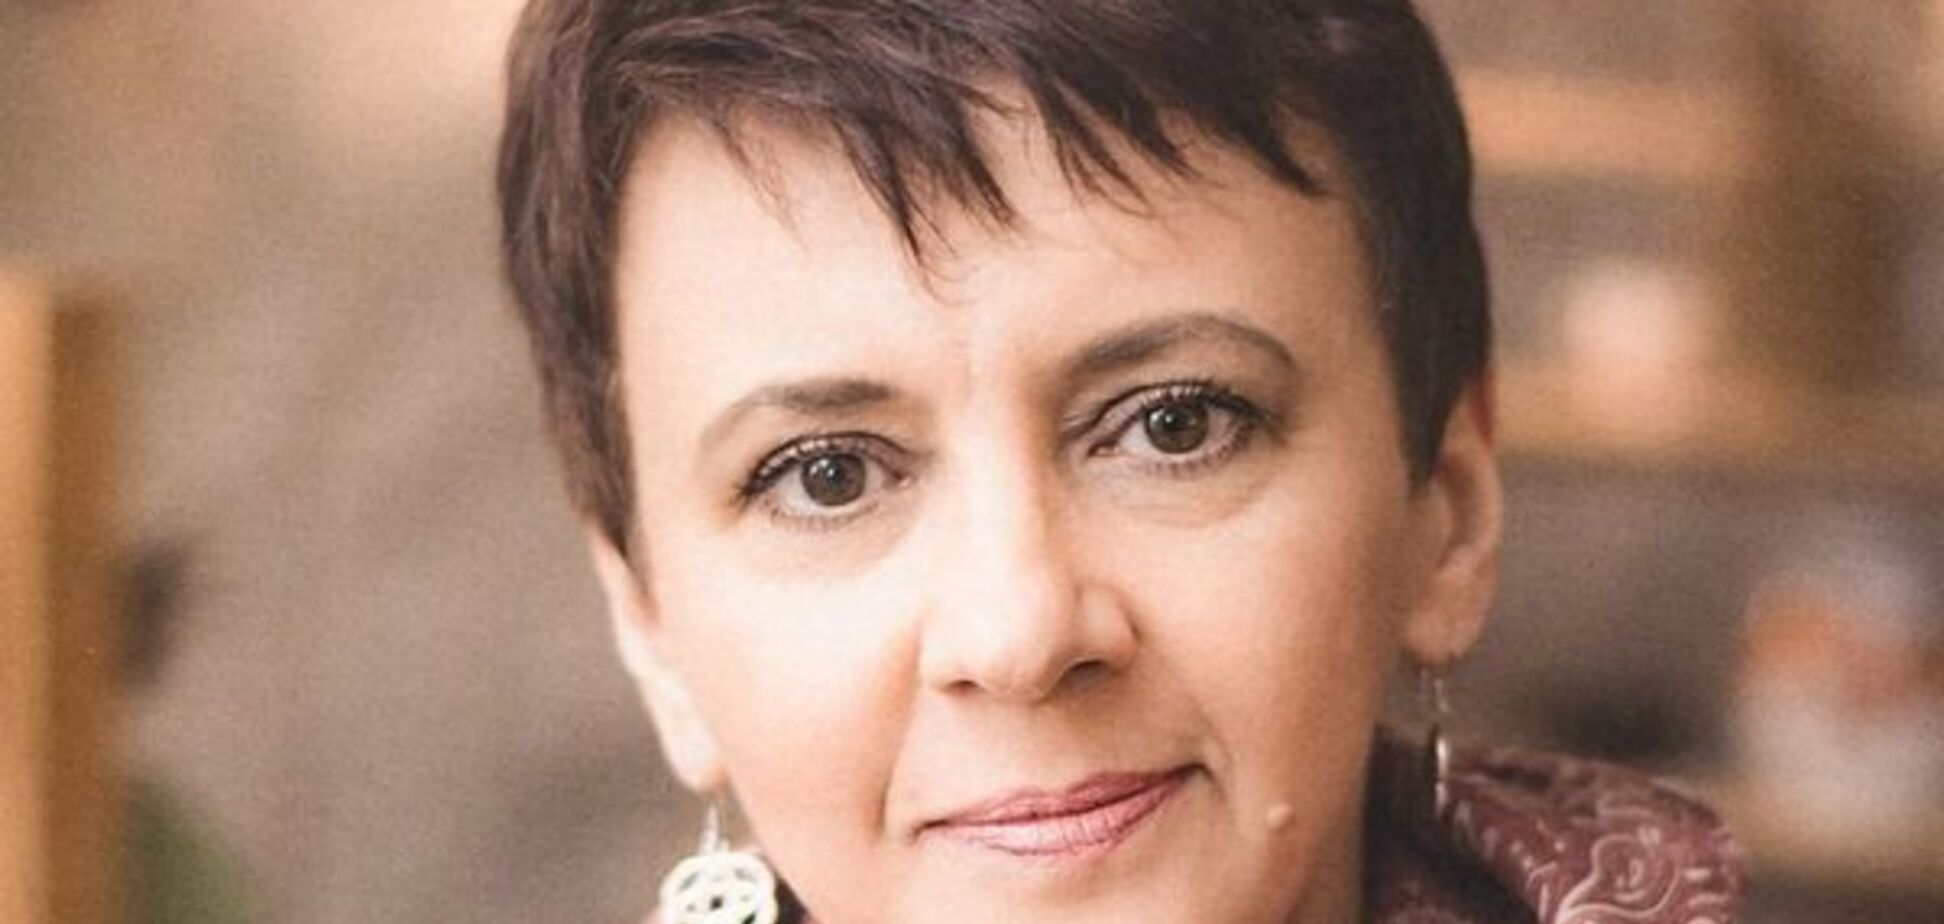 'Давайте покончим с собой?' Забужко разгромила идею мира с Россией